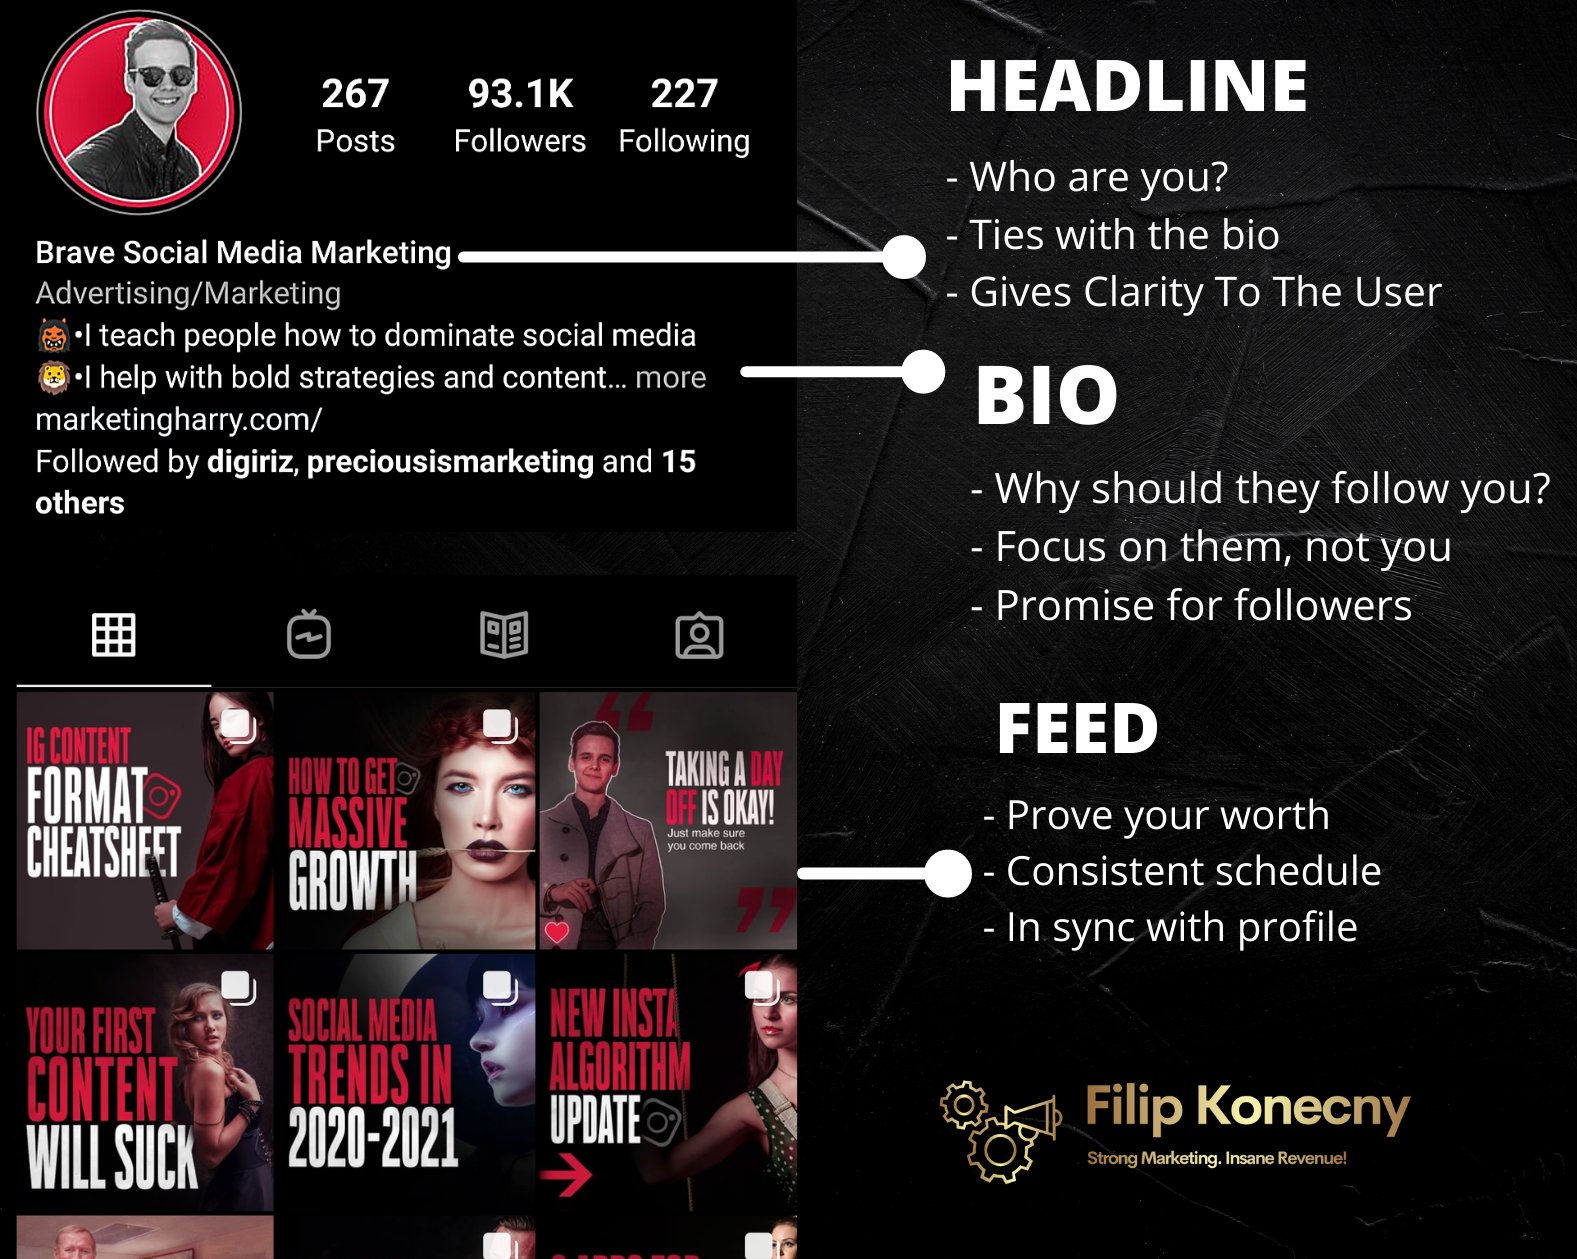 Profile optimization infographic